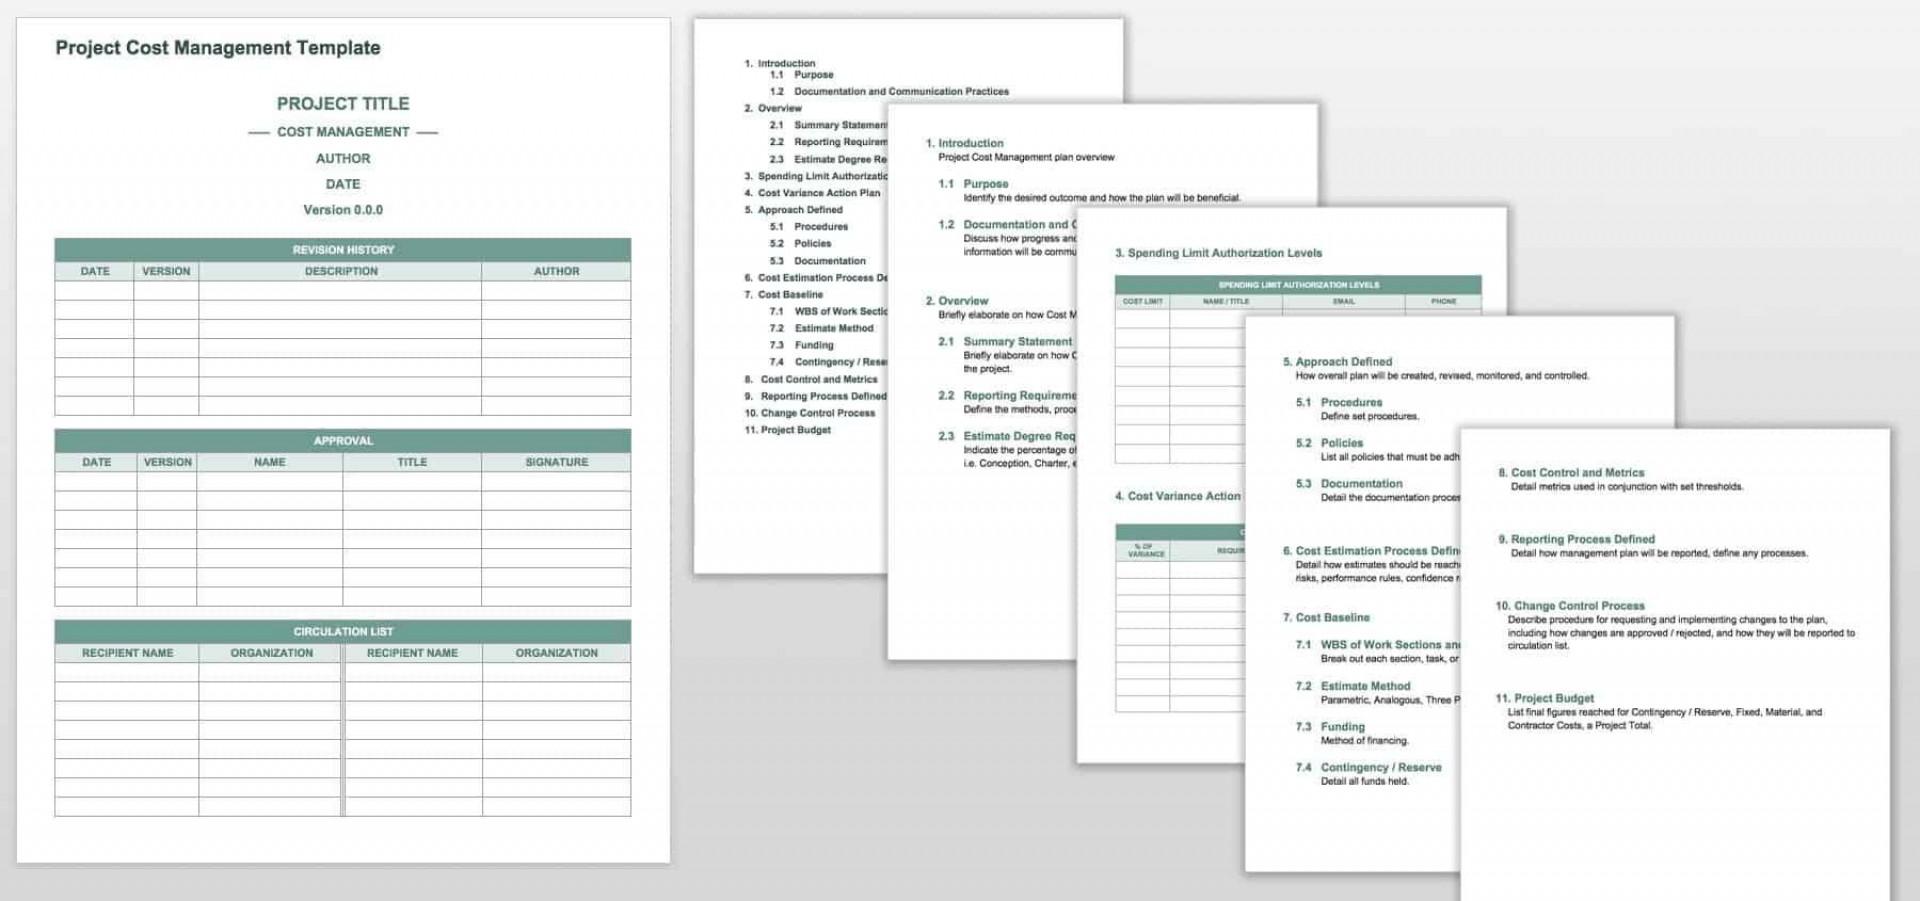 002 Unique Project Management Plan Template Word Free Image  Simple1920